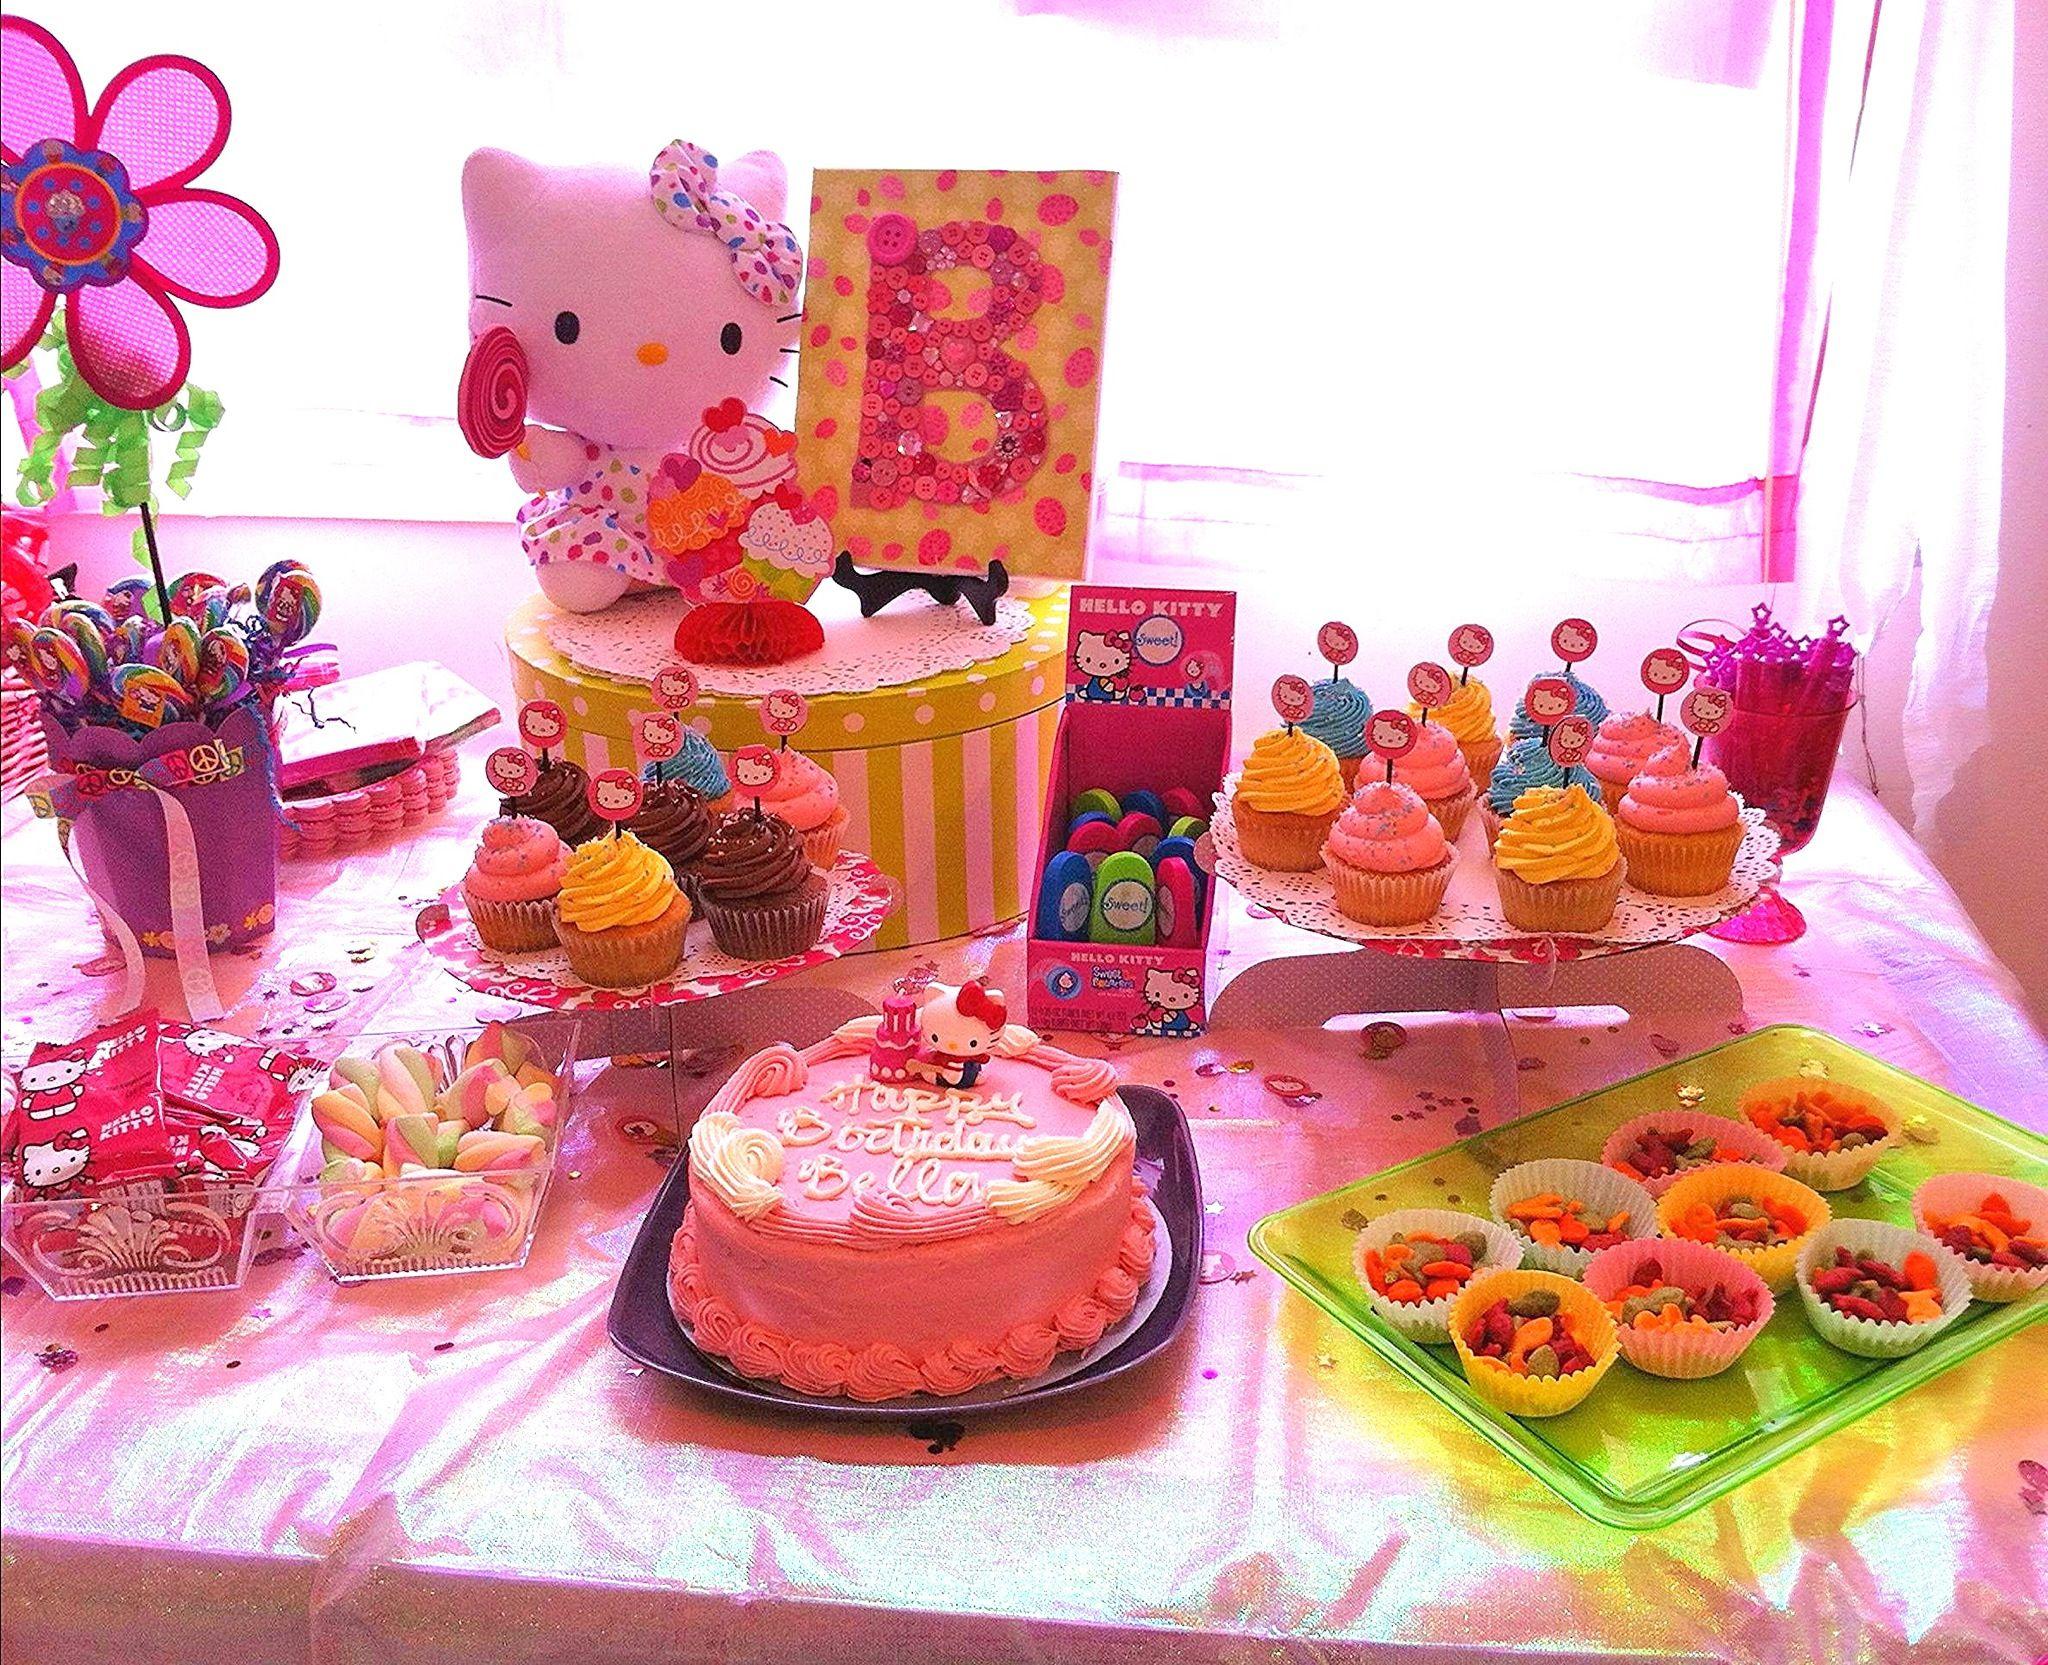 hello kitty birthday party table decoration  birthday